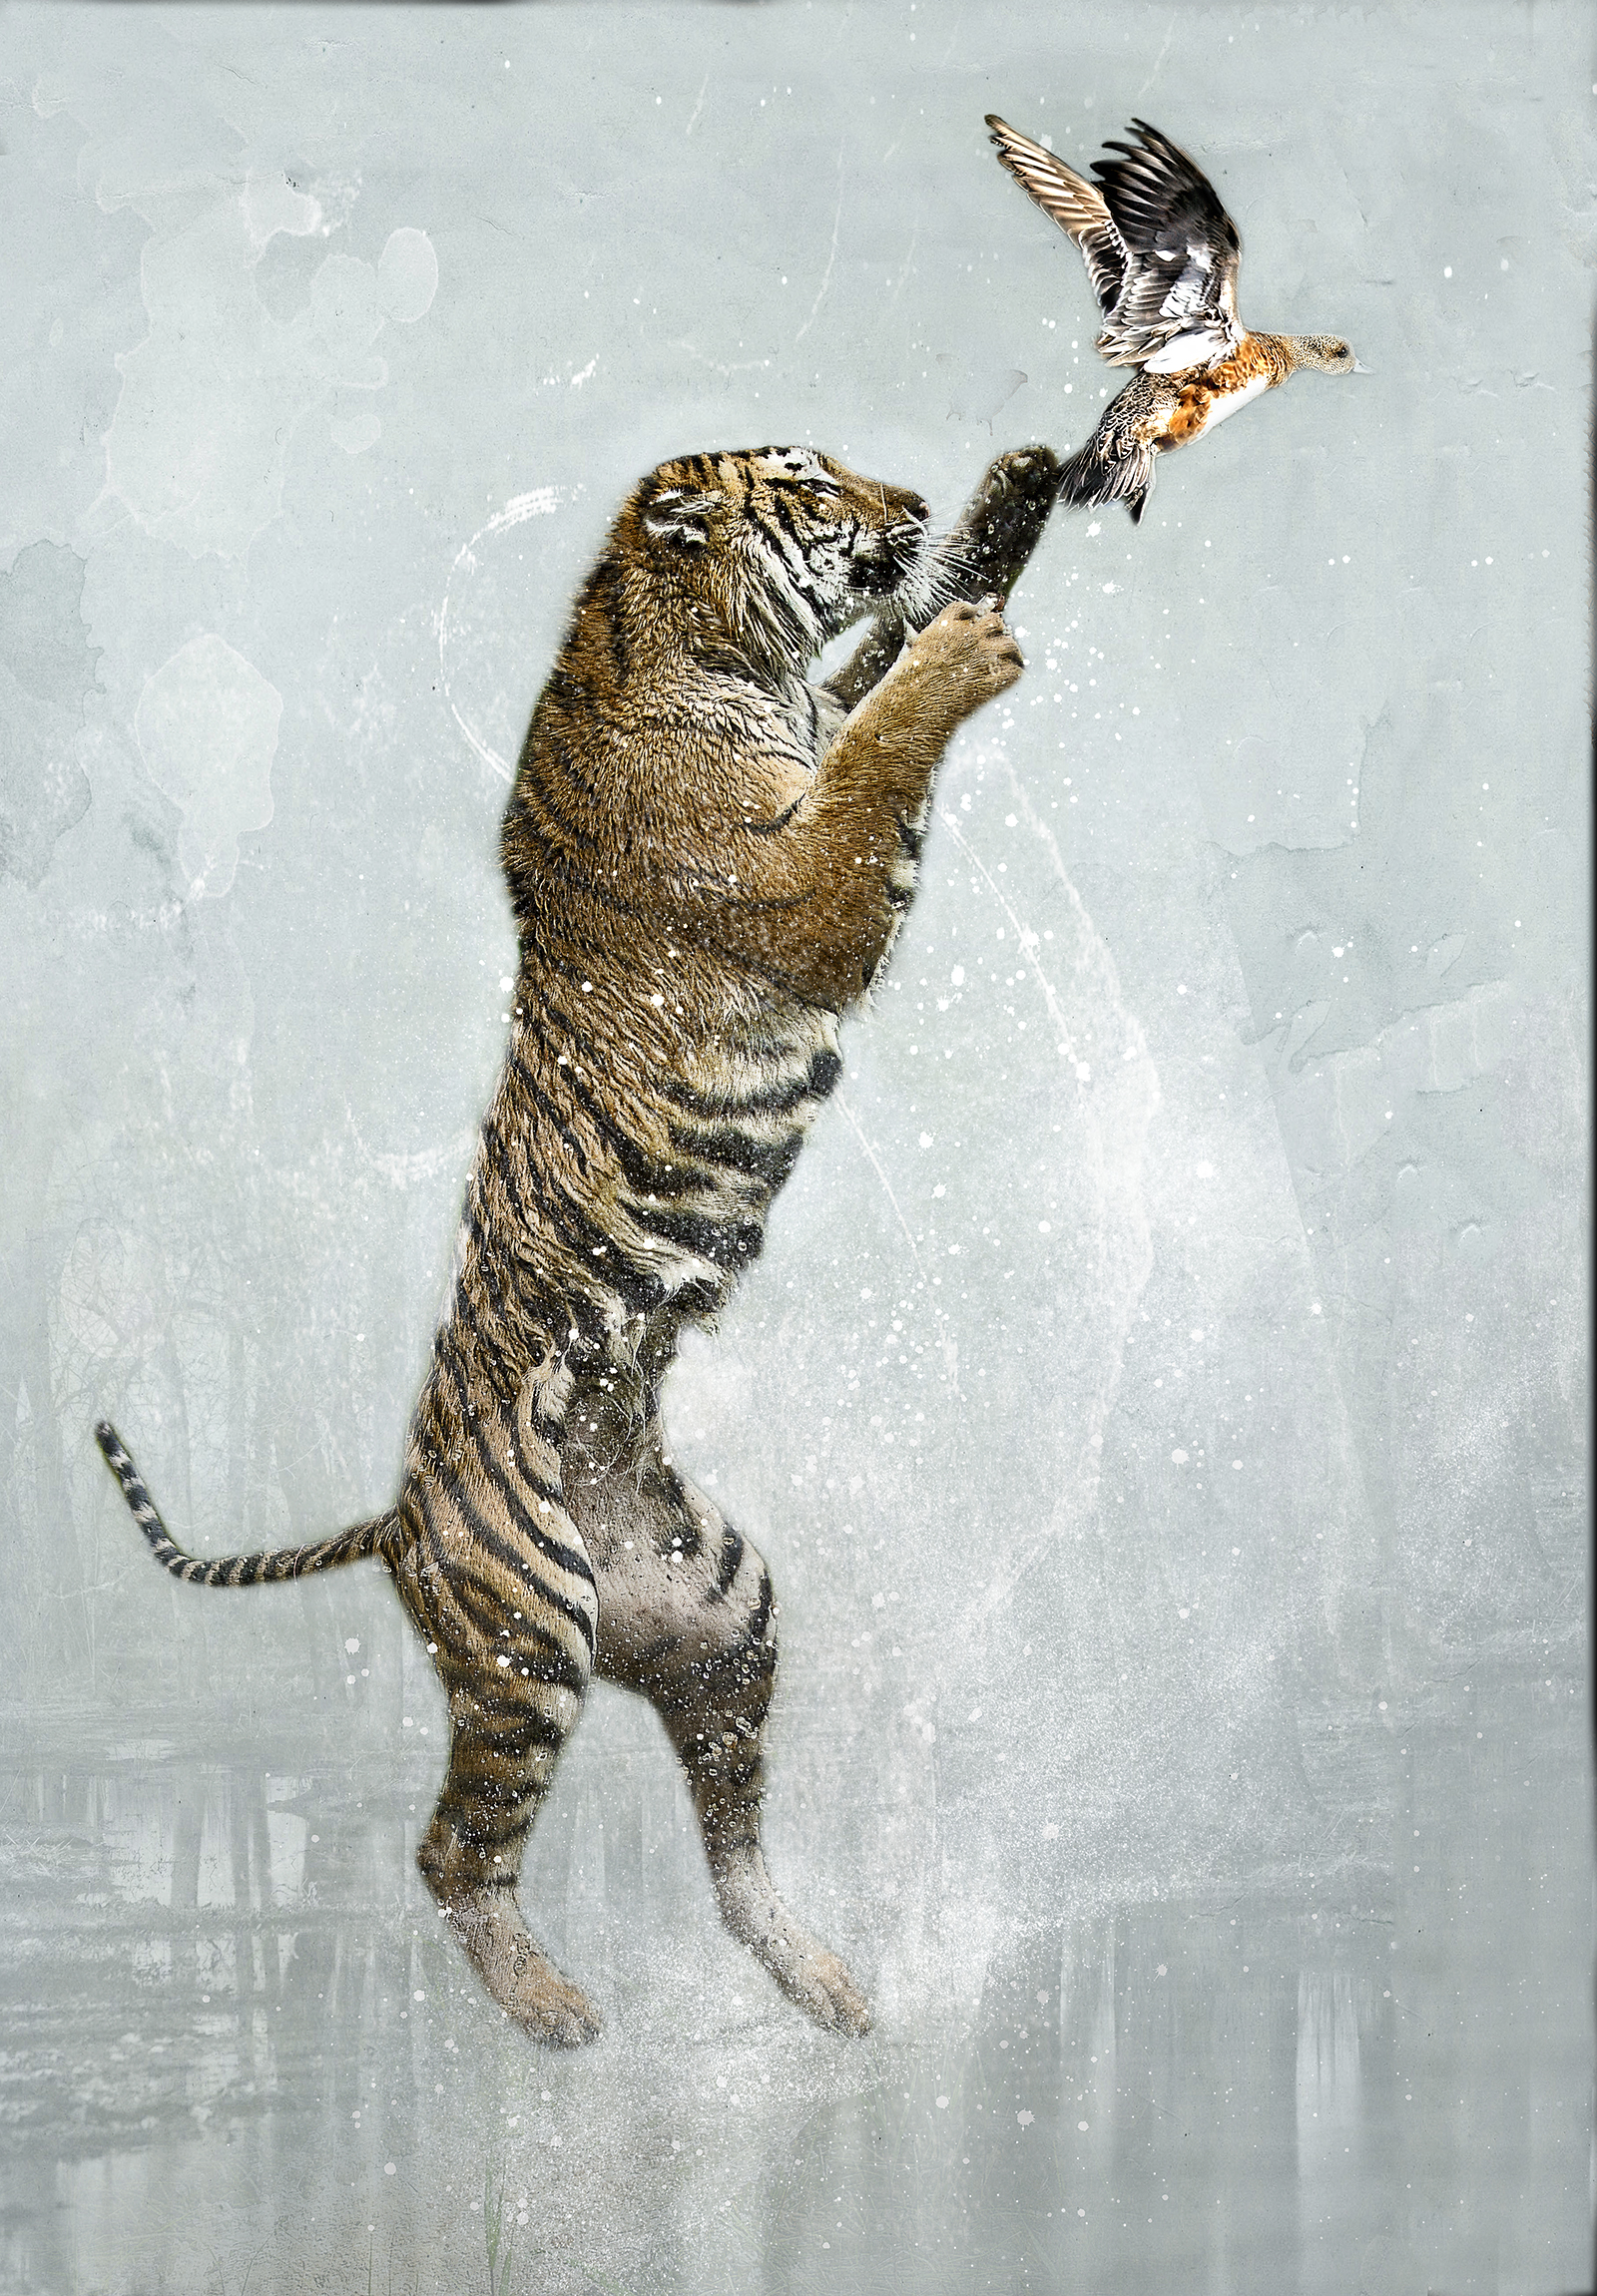 Tiger Leap 1